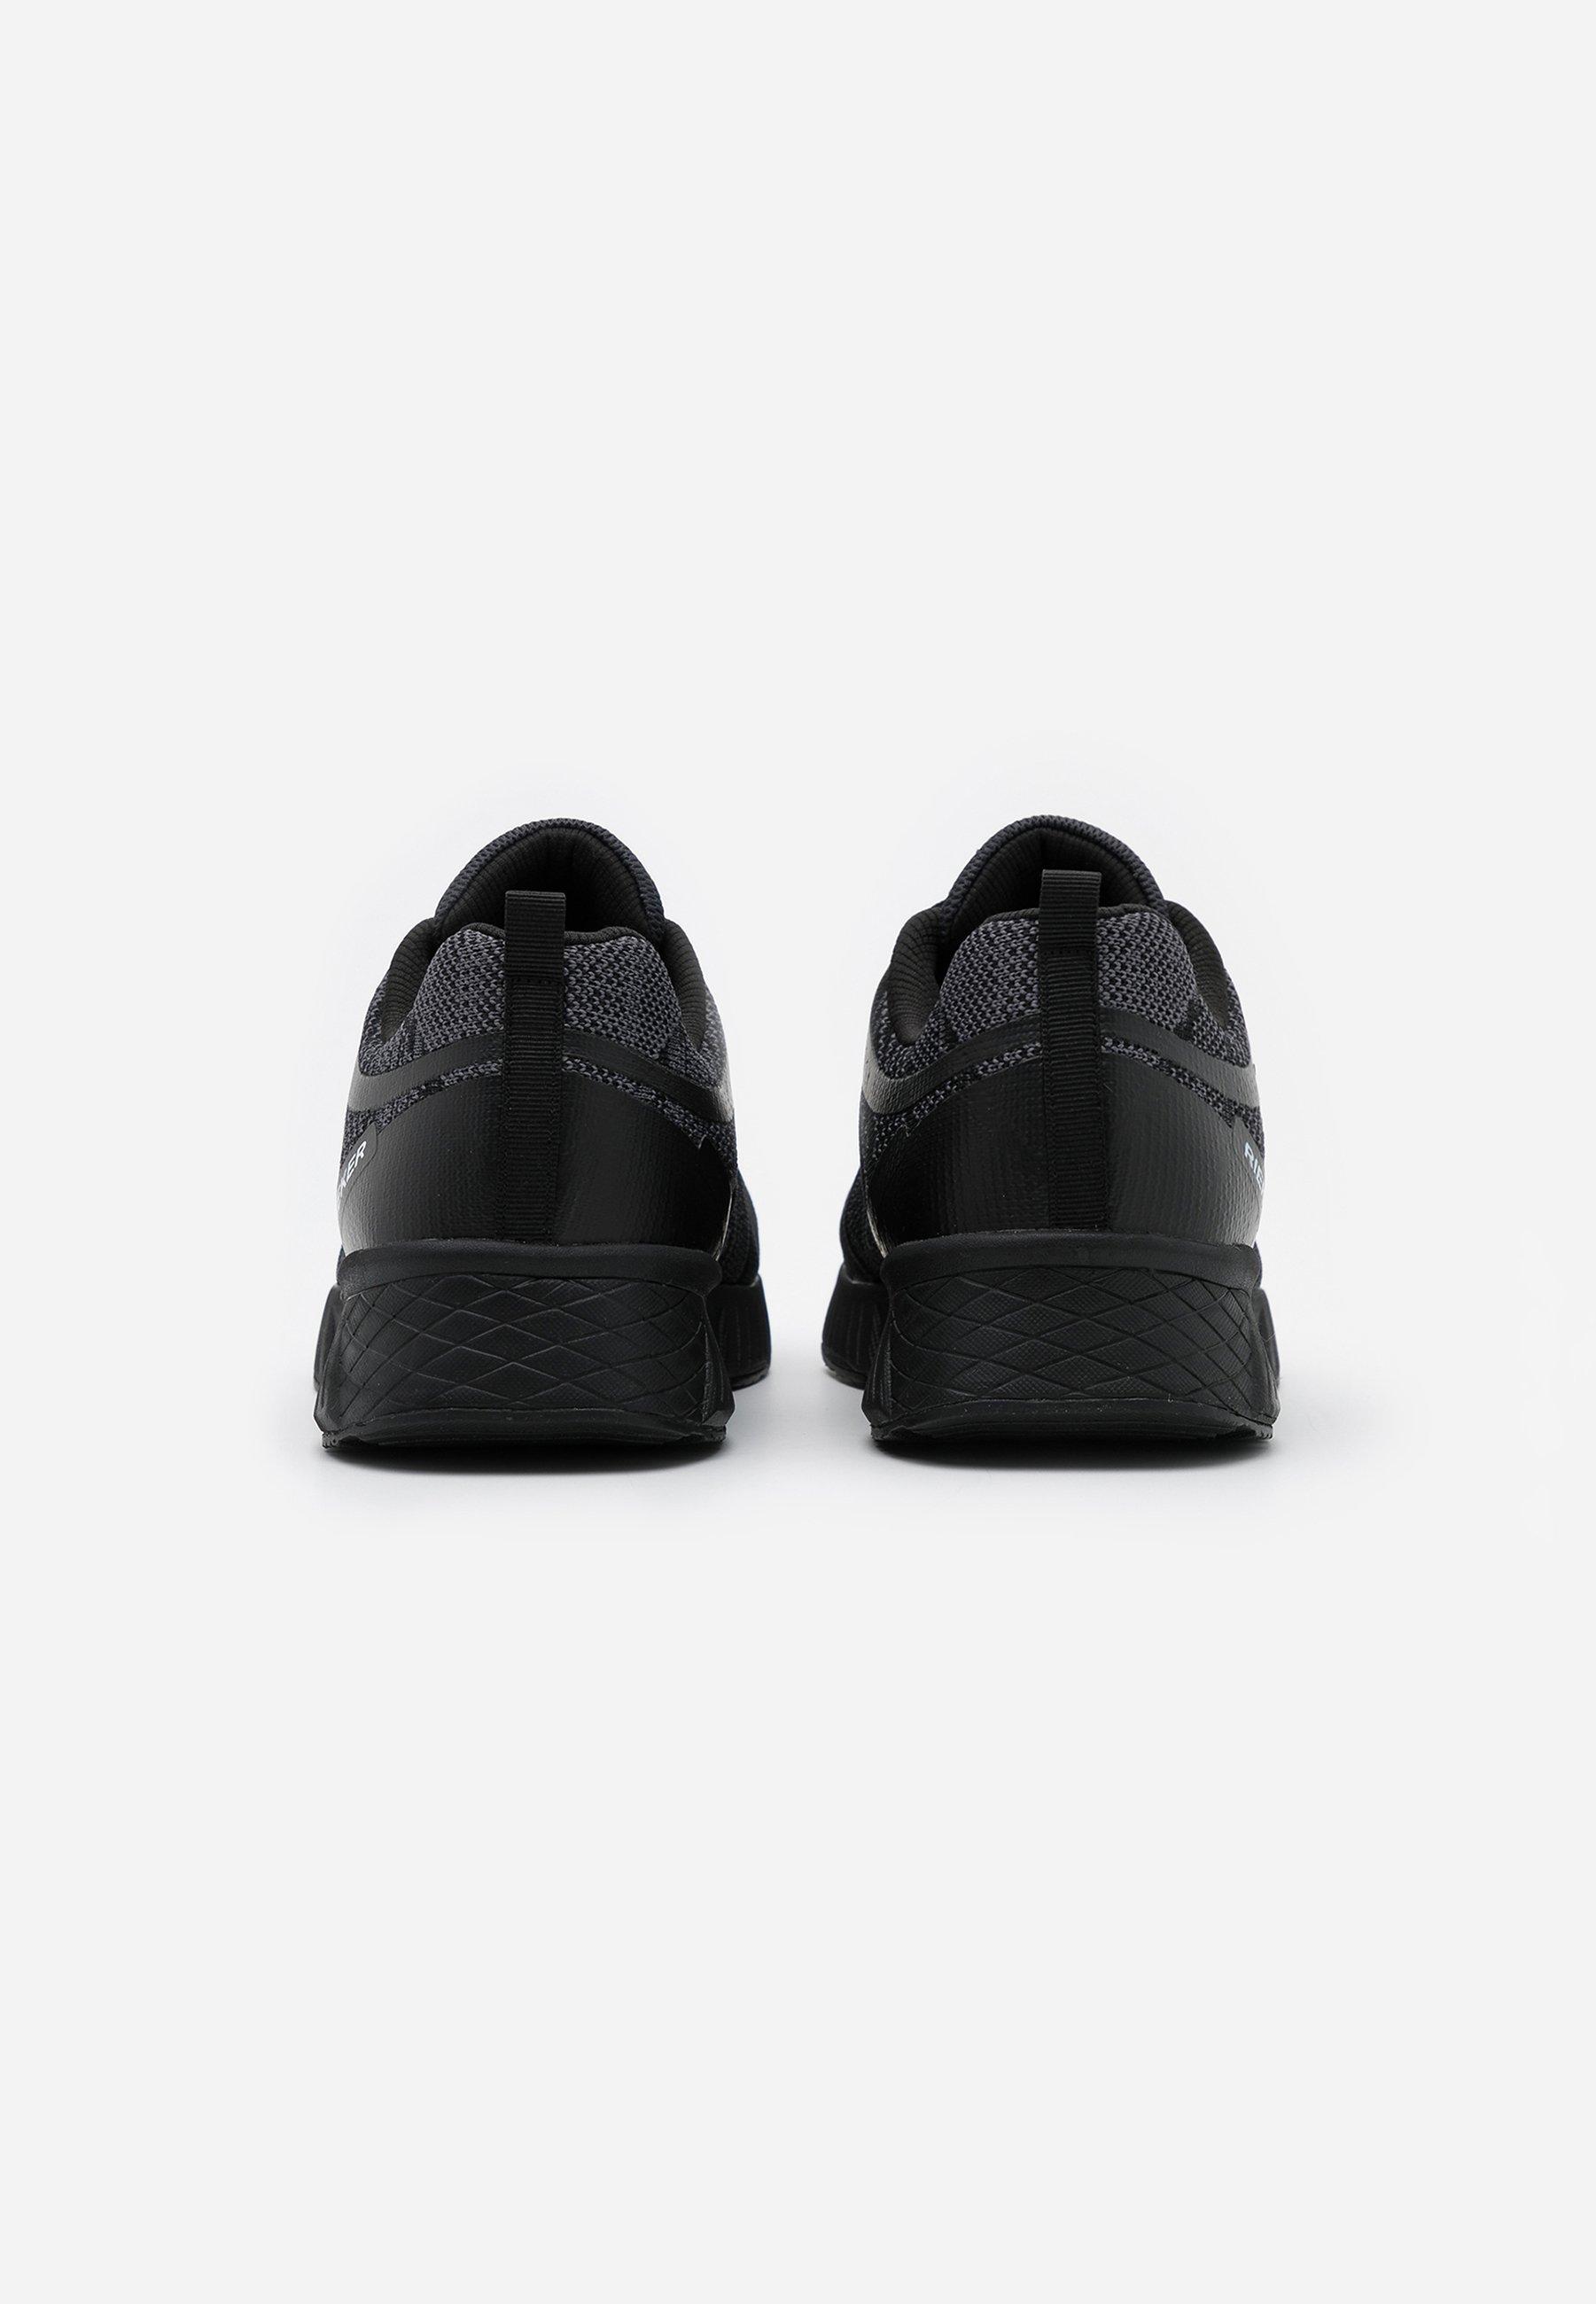 Rieker Sneaker low - schwarz - Herrenschuhe oUc3m